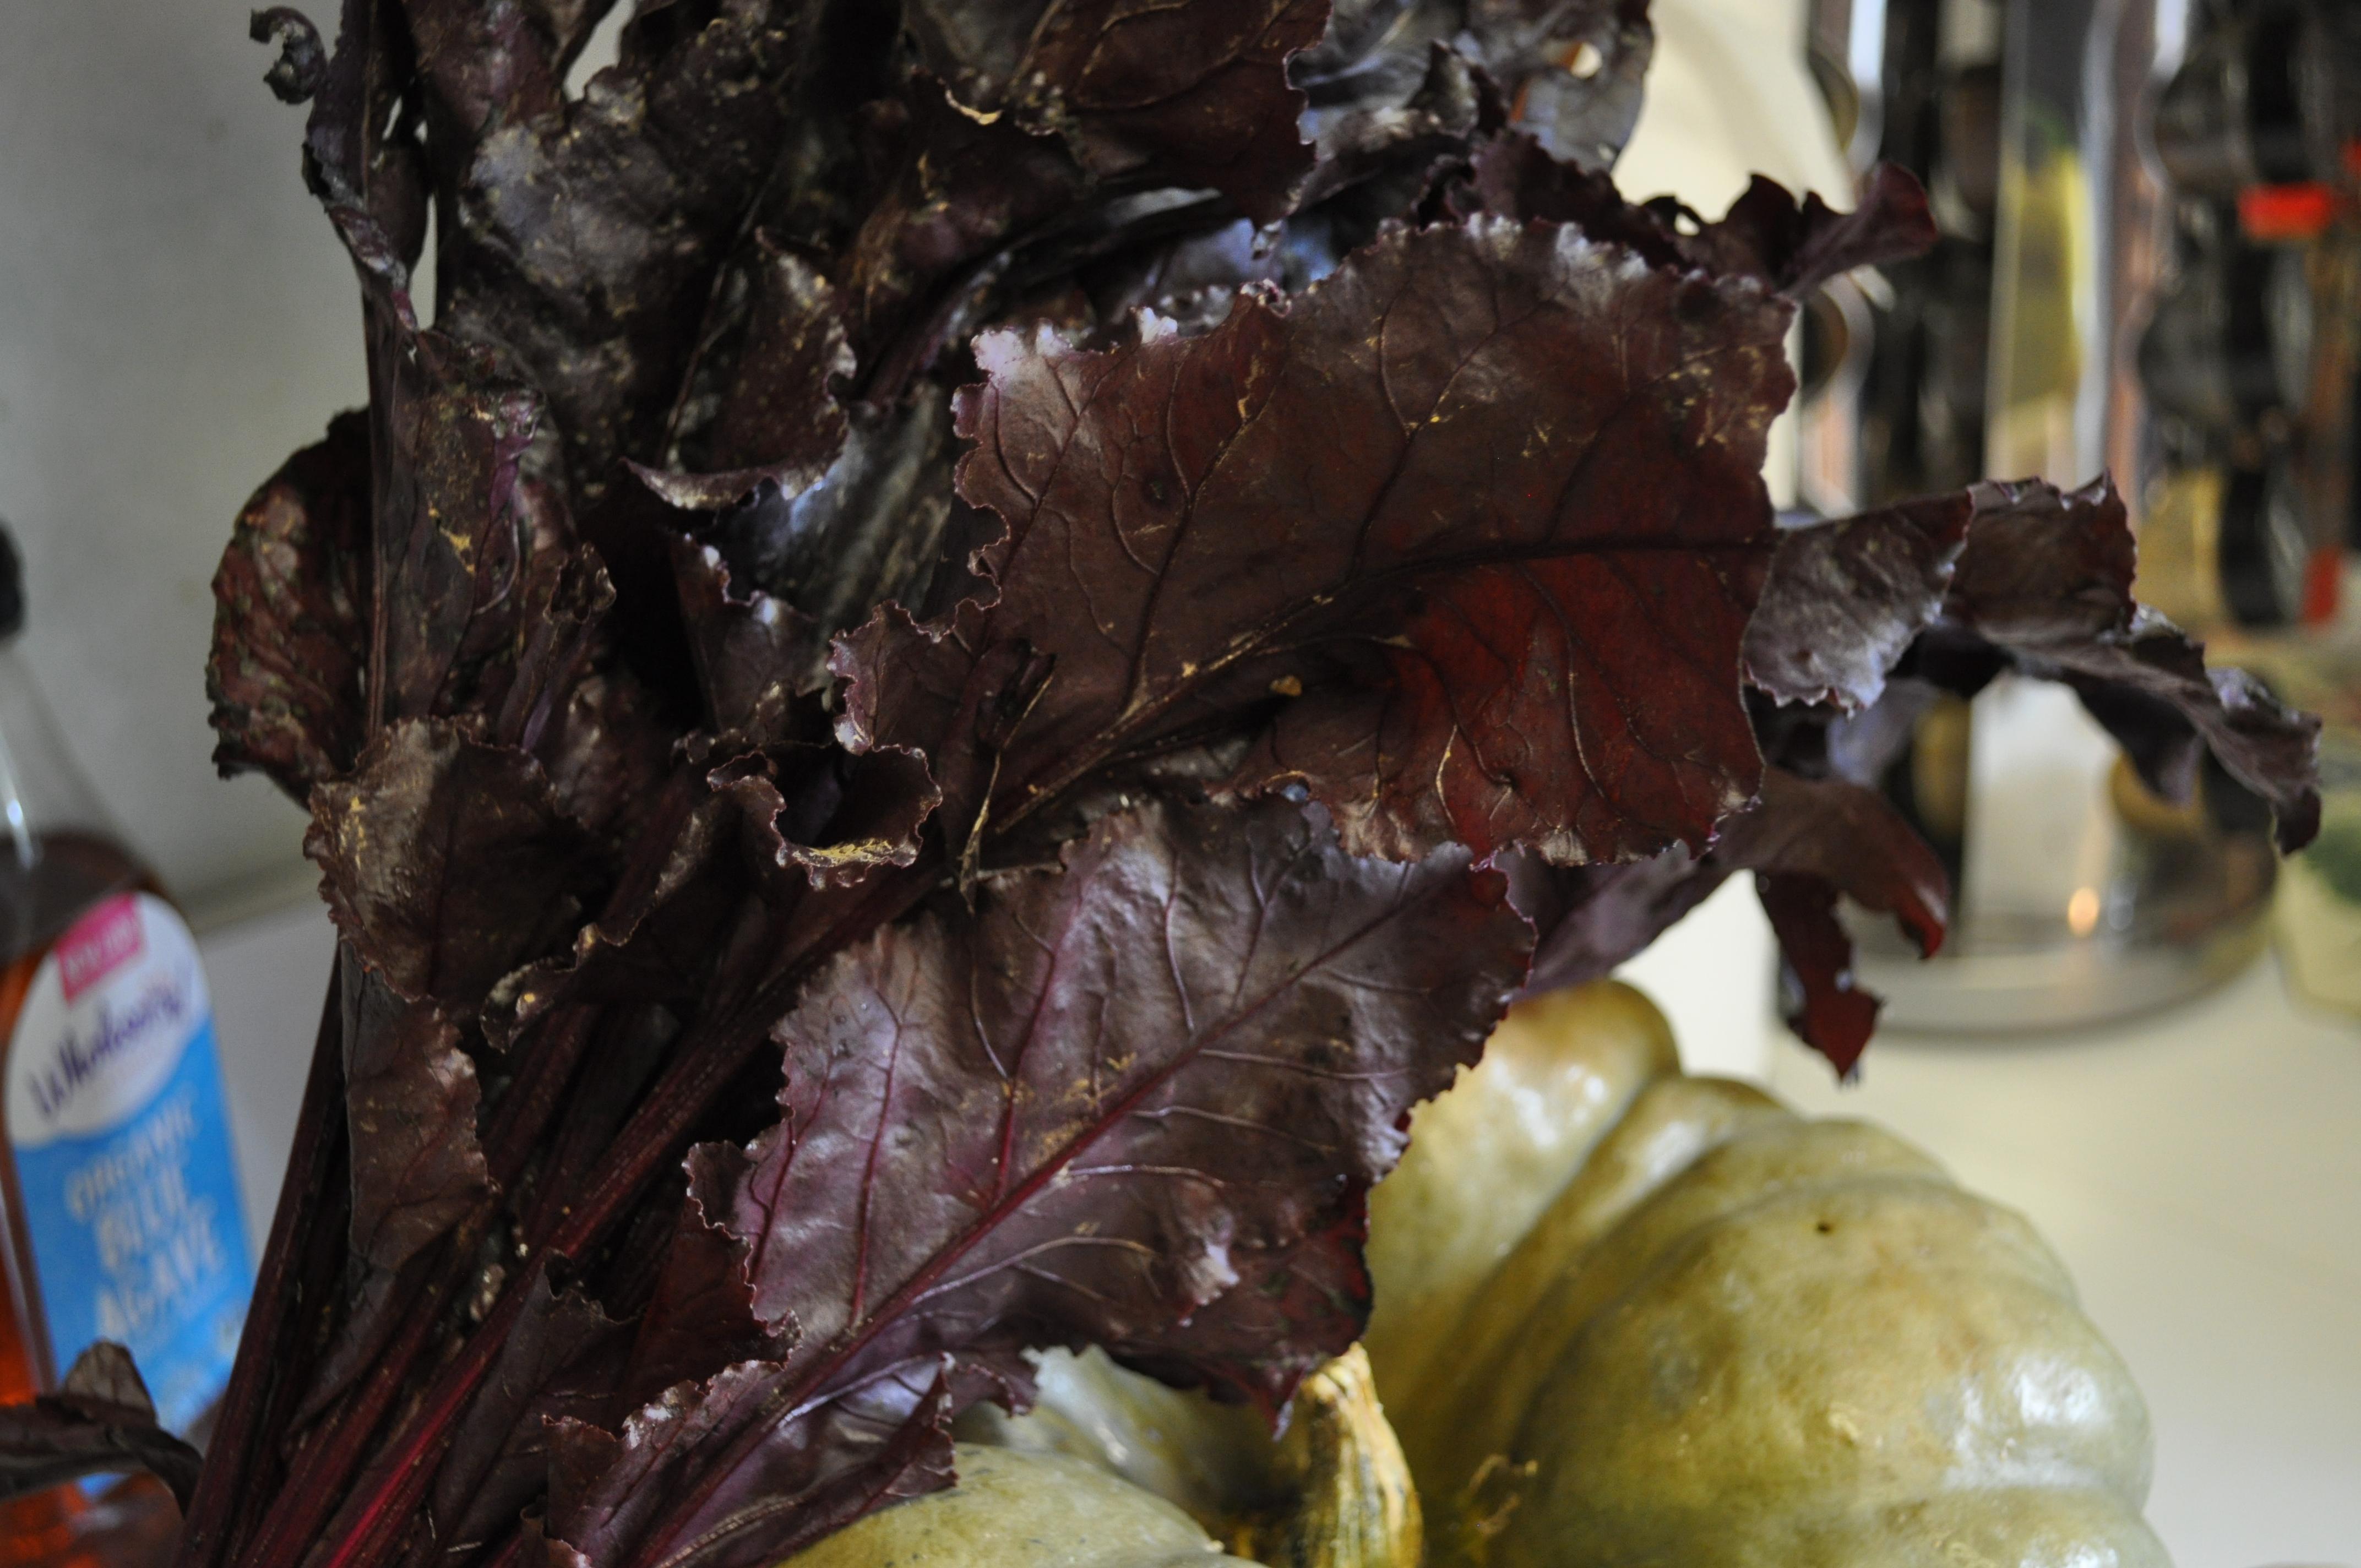 csa-and-more-interesting-veggies-018